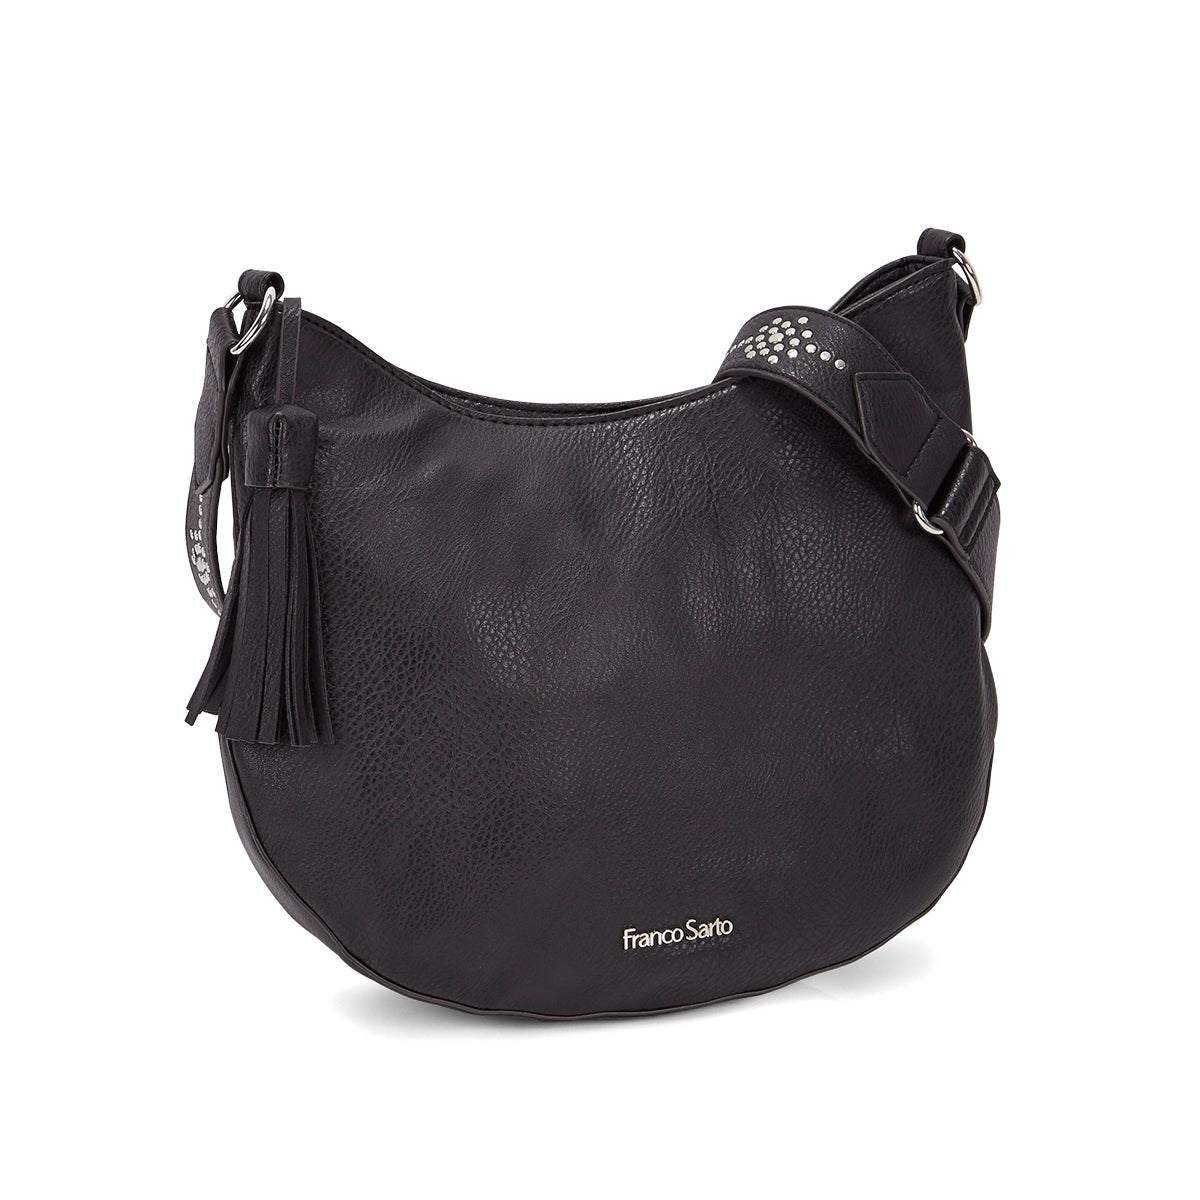 Lds Eva black cross body bag